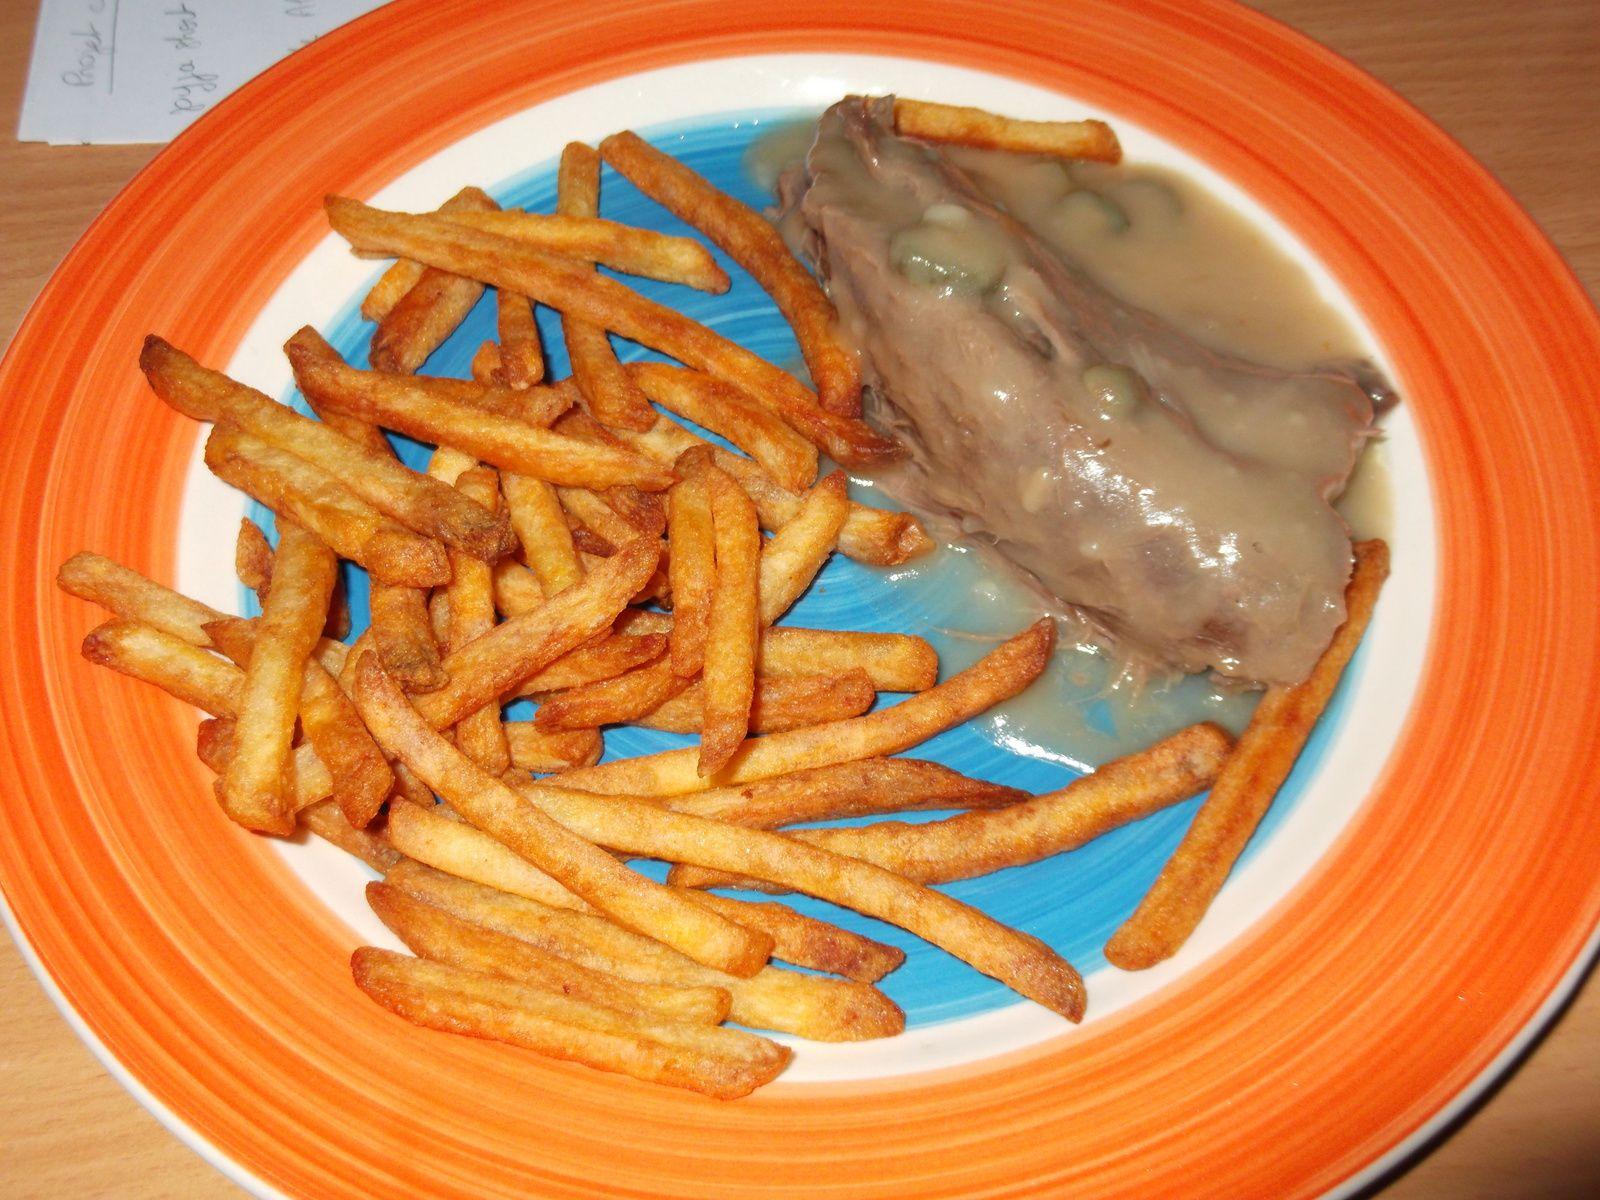 langue de boeuf en sauce + frites